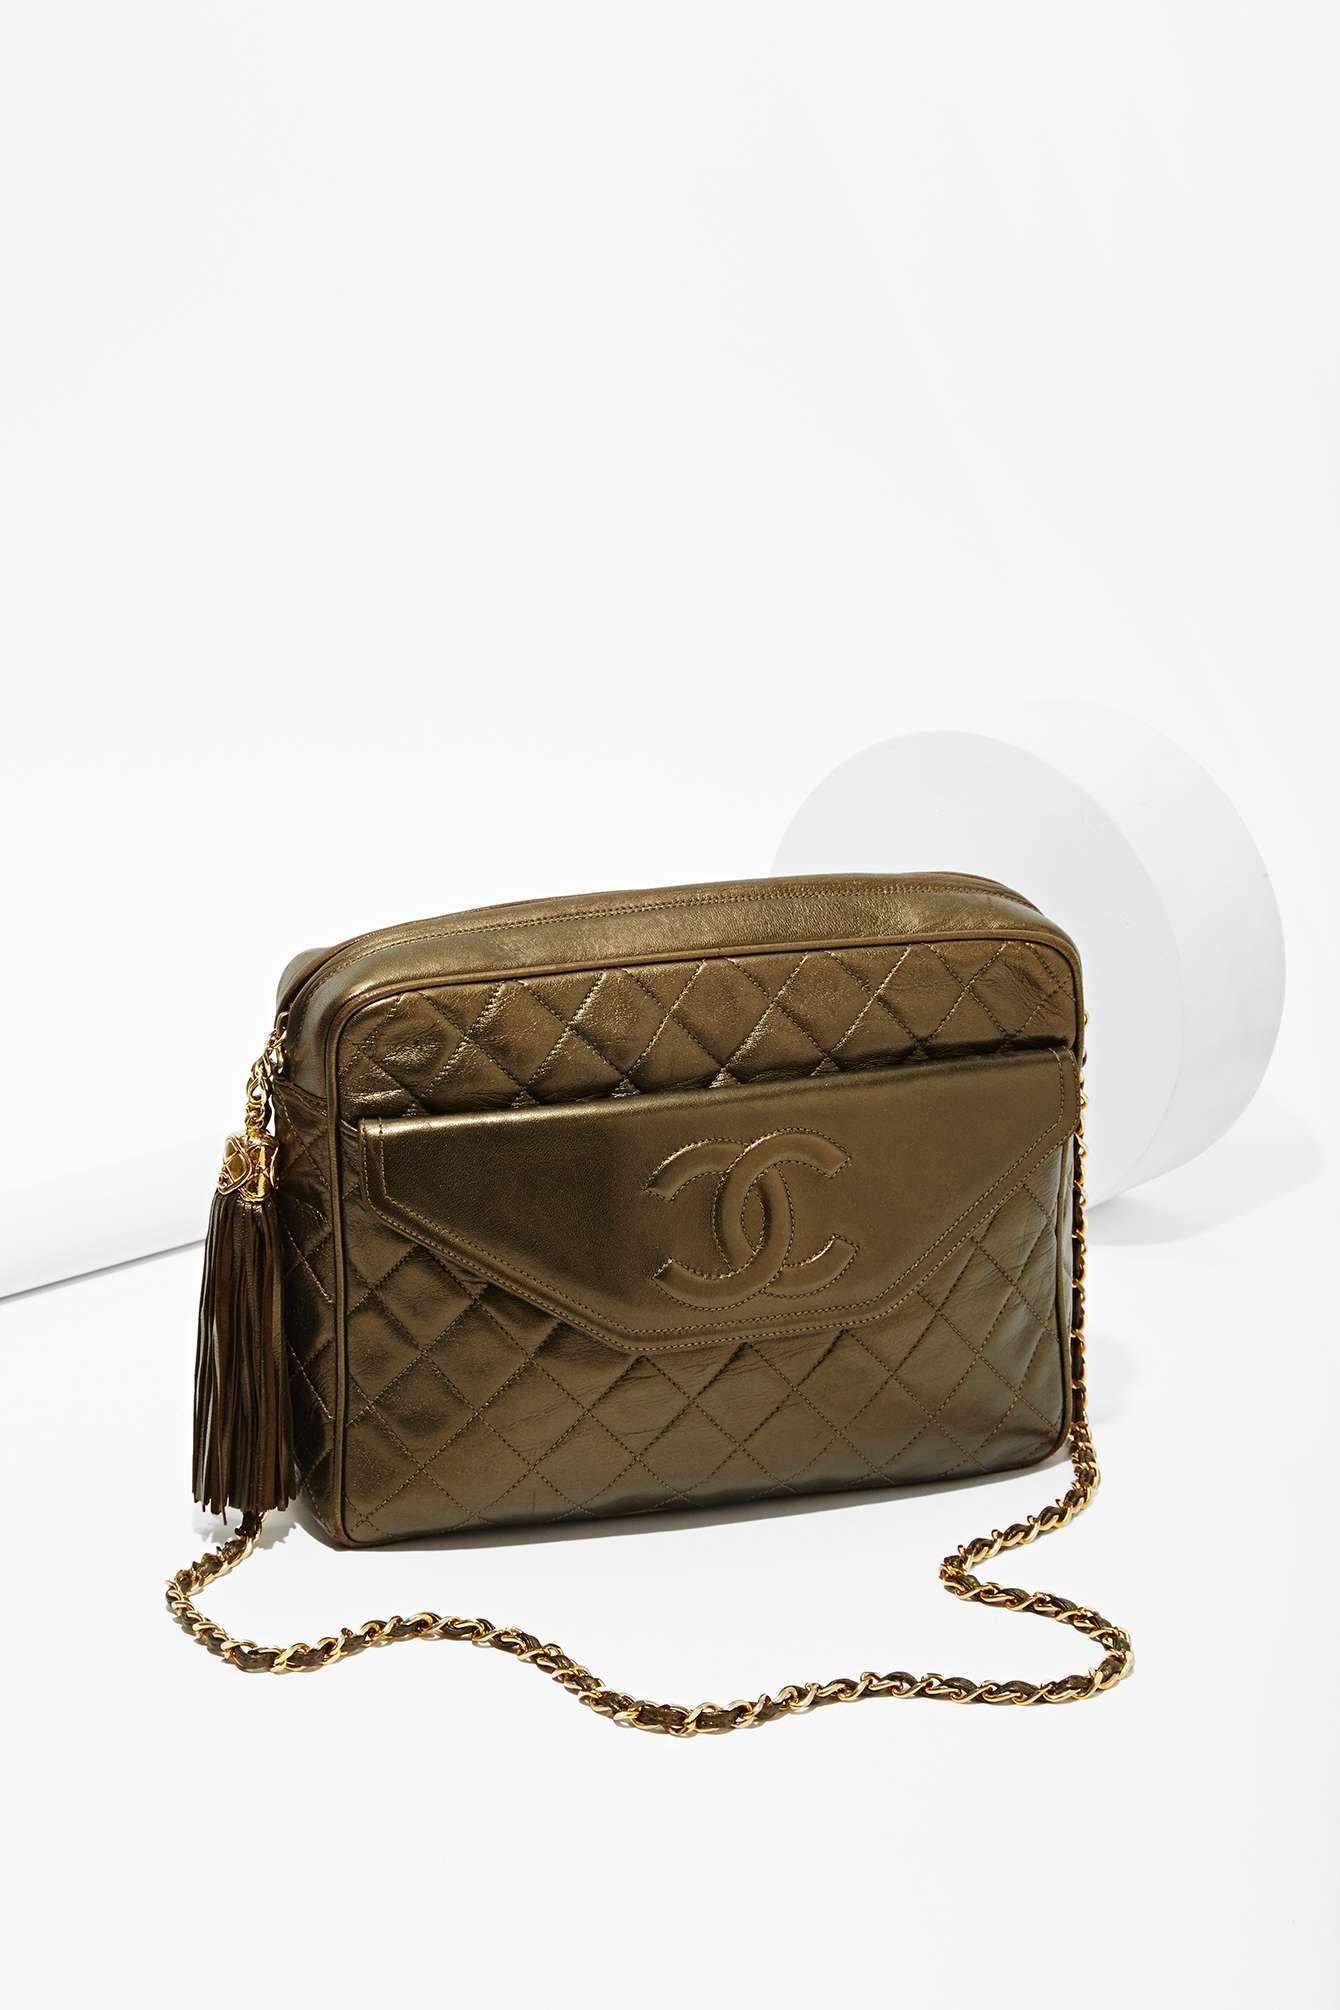 06f58d9853c5 Vintage Chanel Metallic Tassel Bag